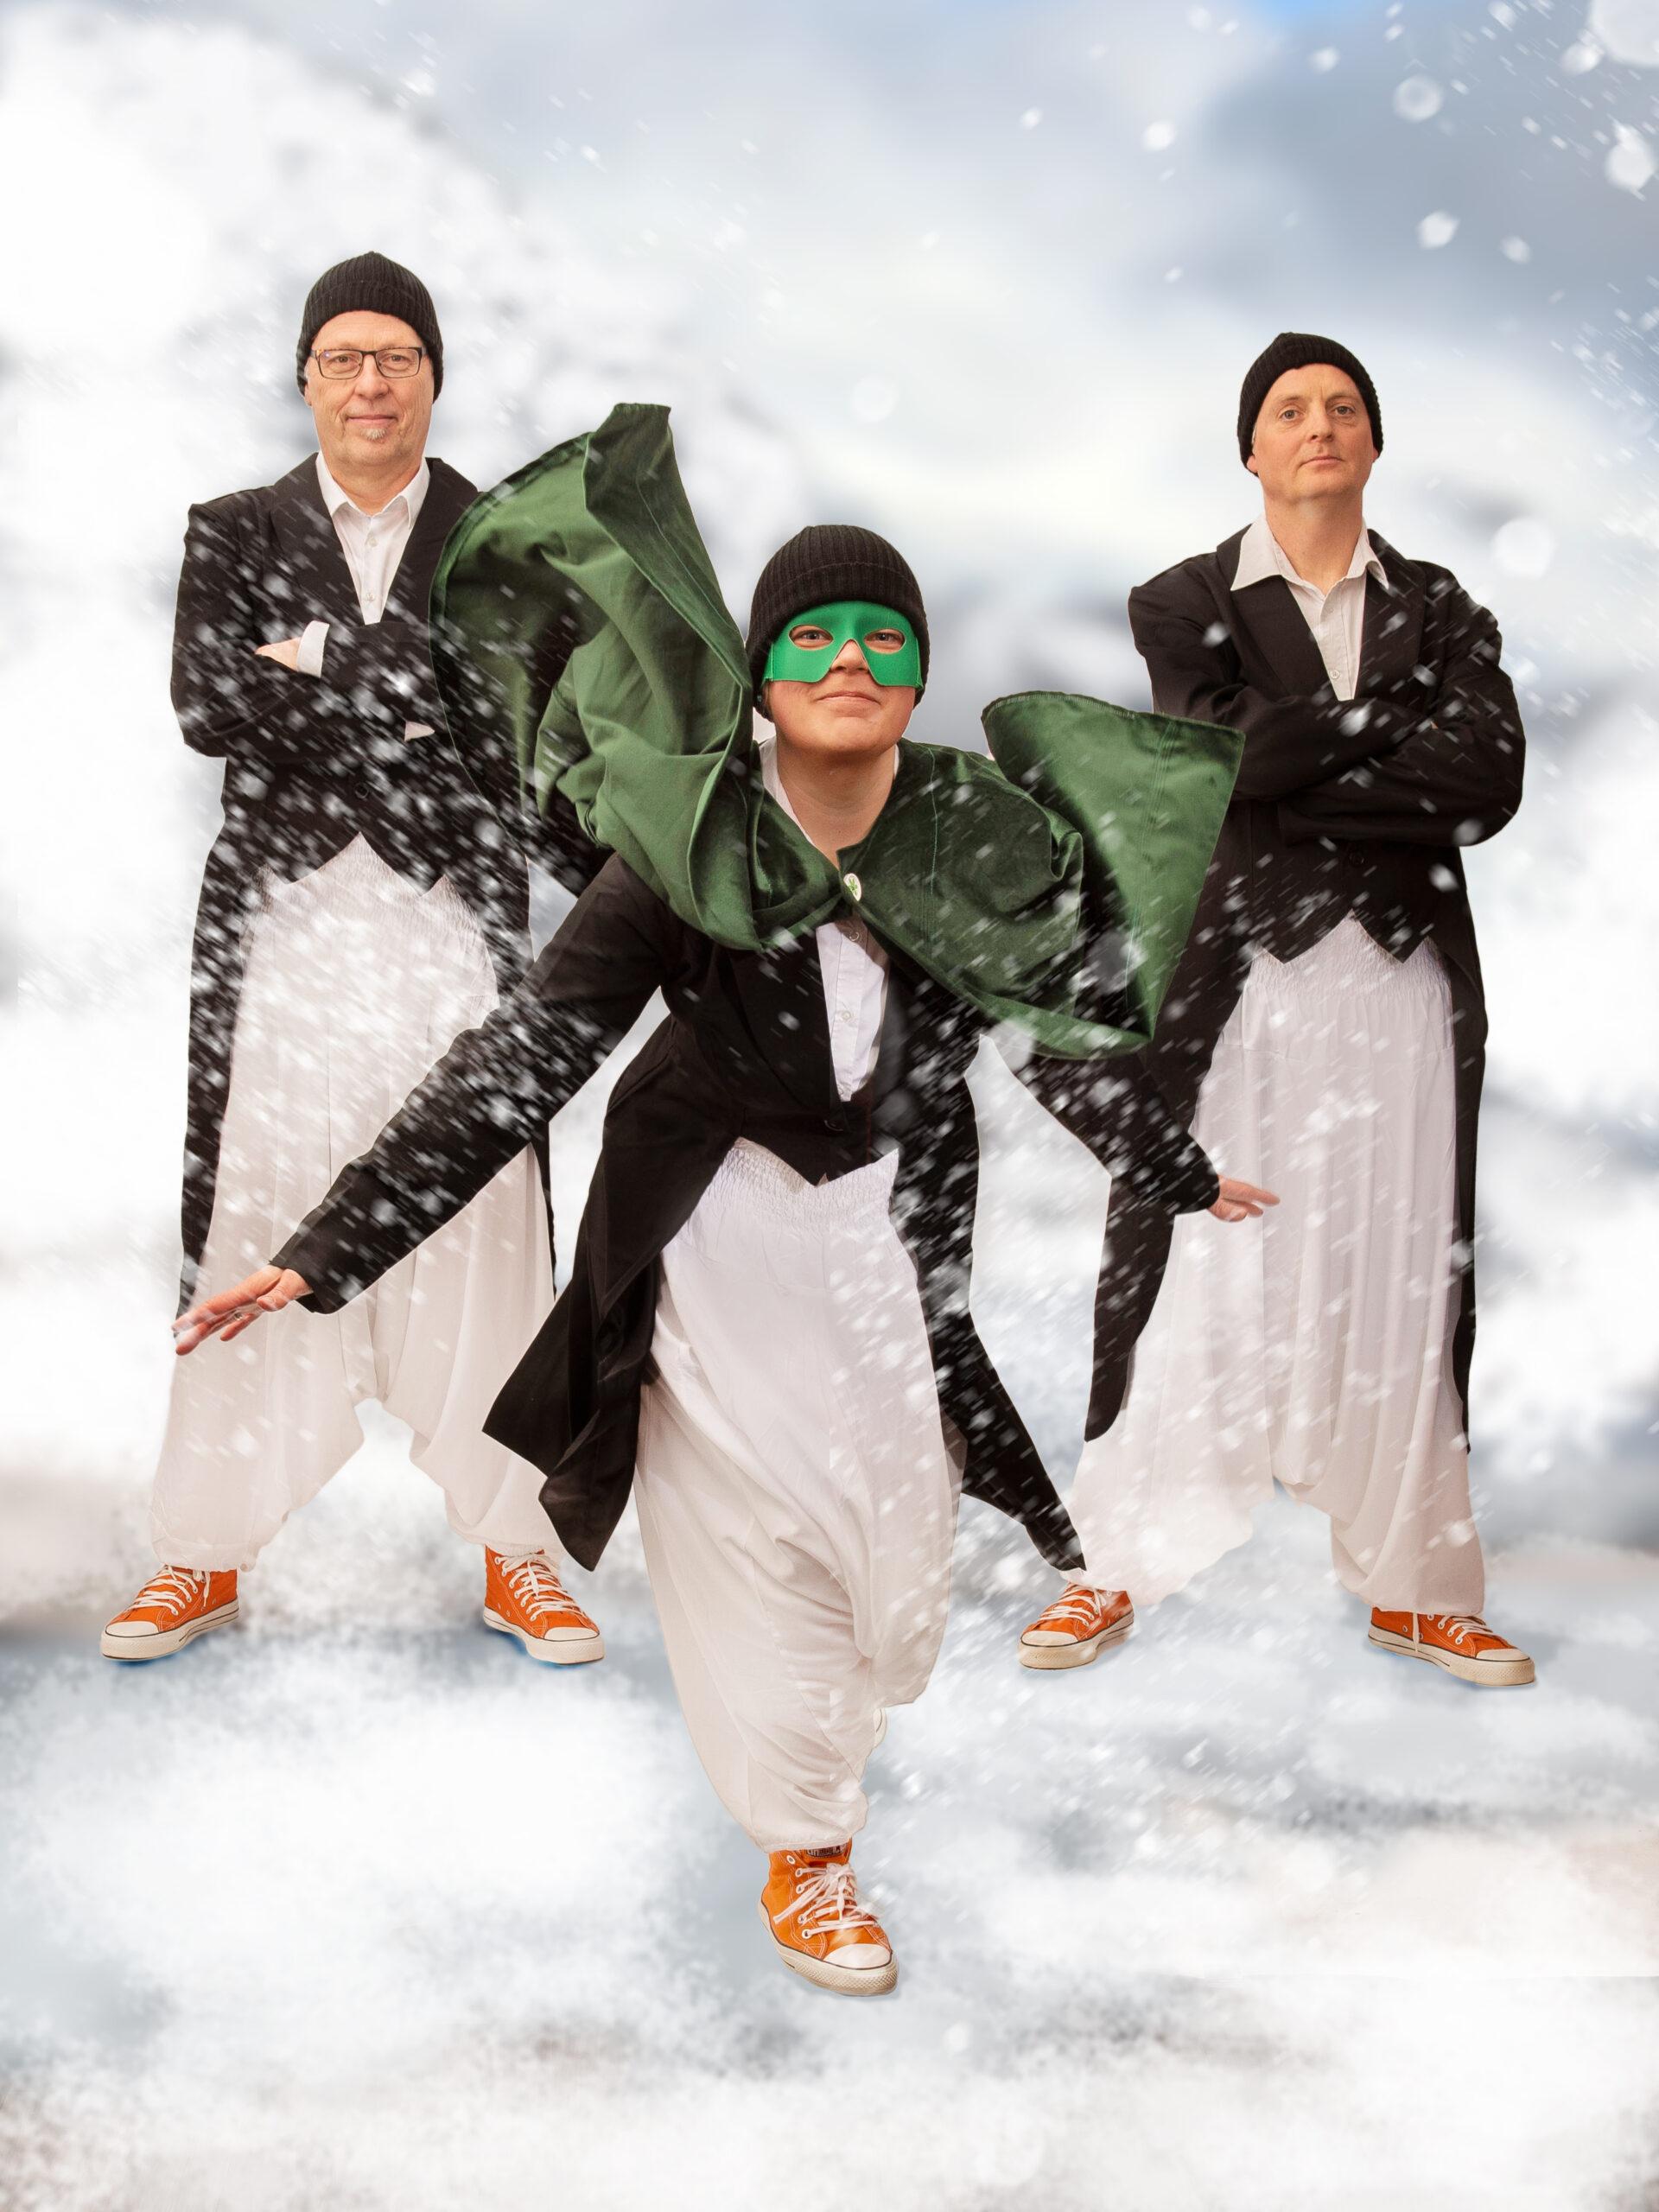 CD-Release am 12.08.21 – Pingugirl rettet die Welt